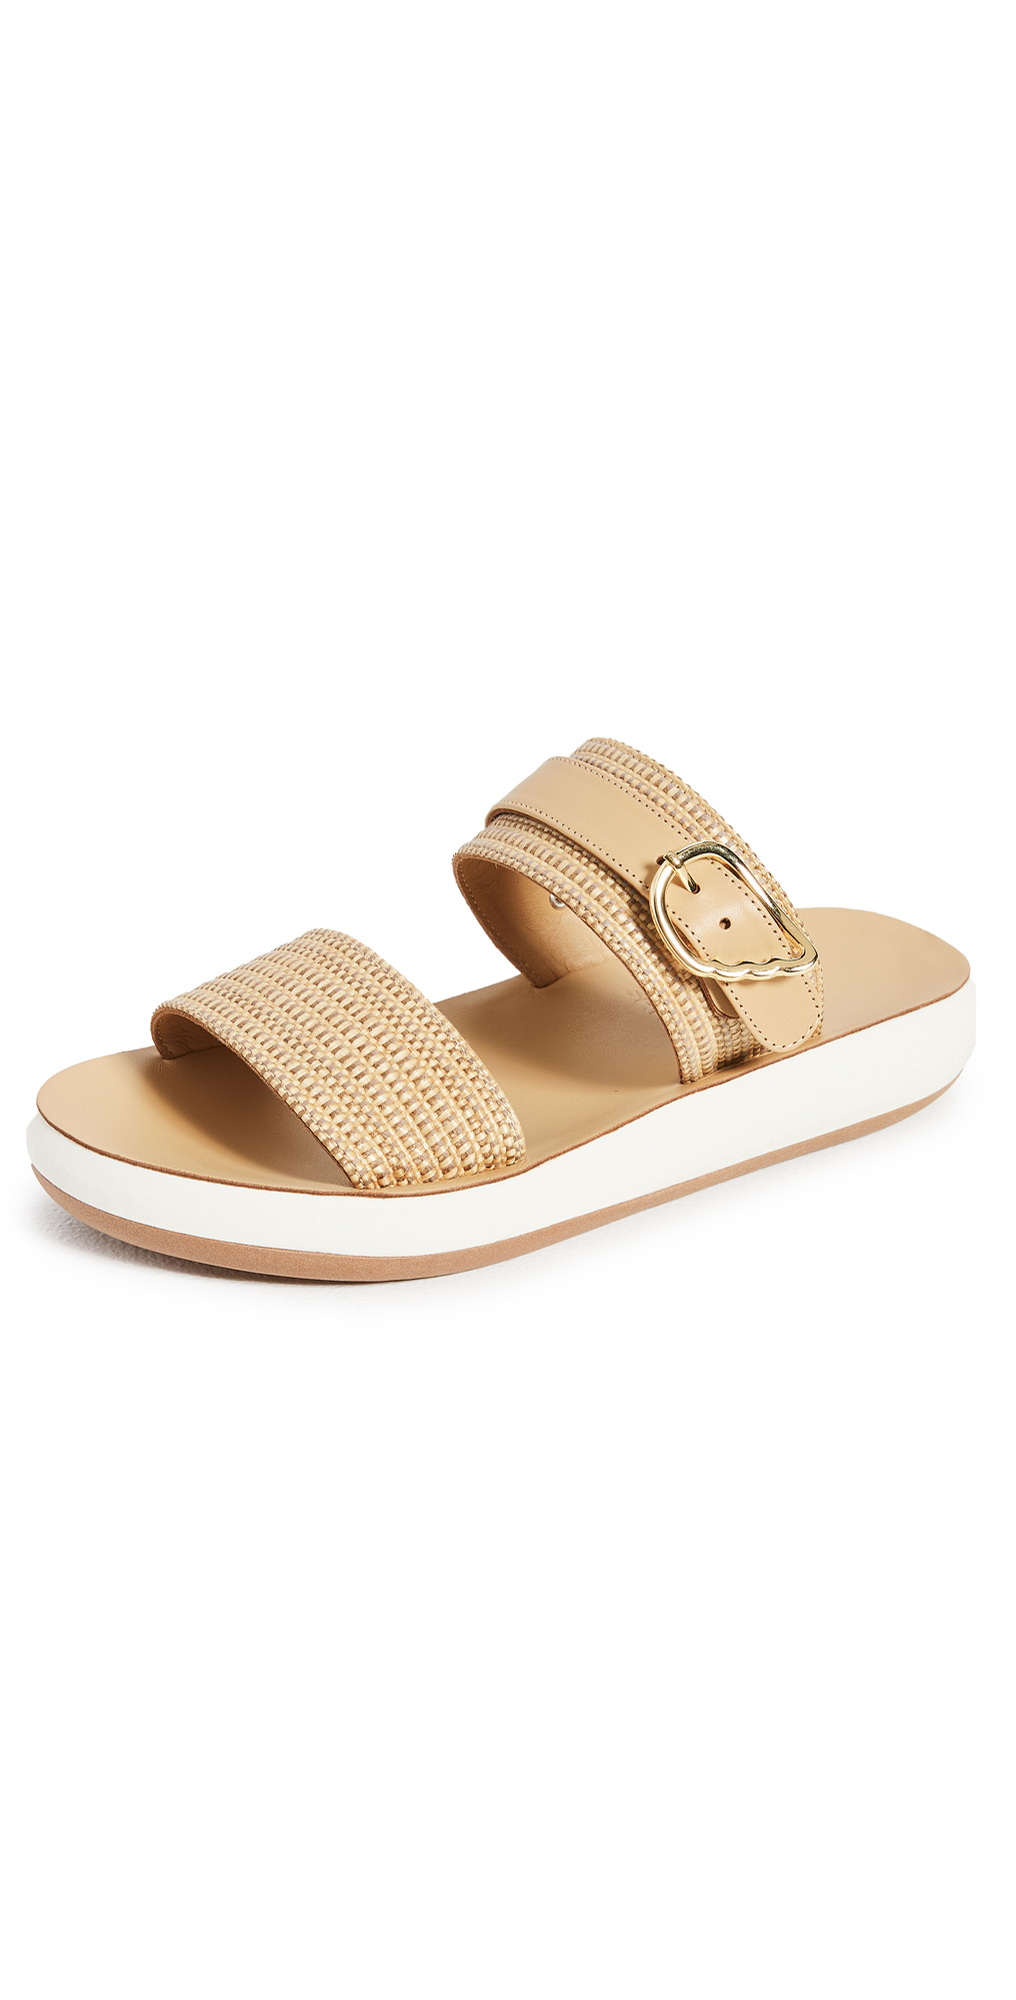 Ancient Greek Sandals Preveza Comfort Raffia Sandals